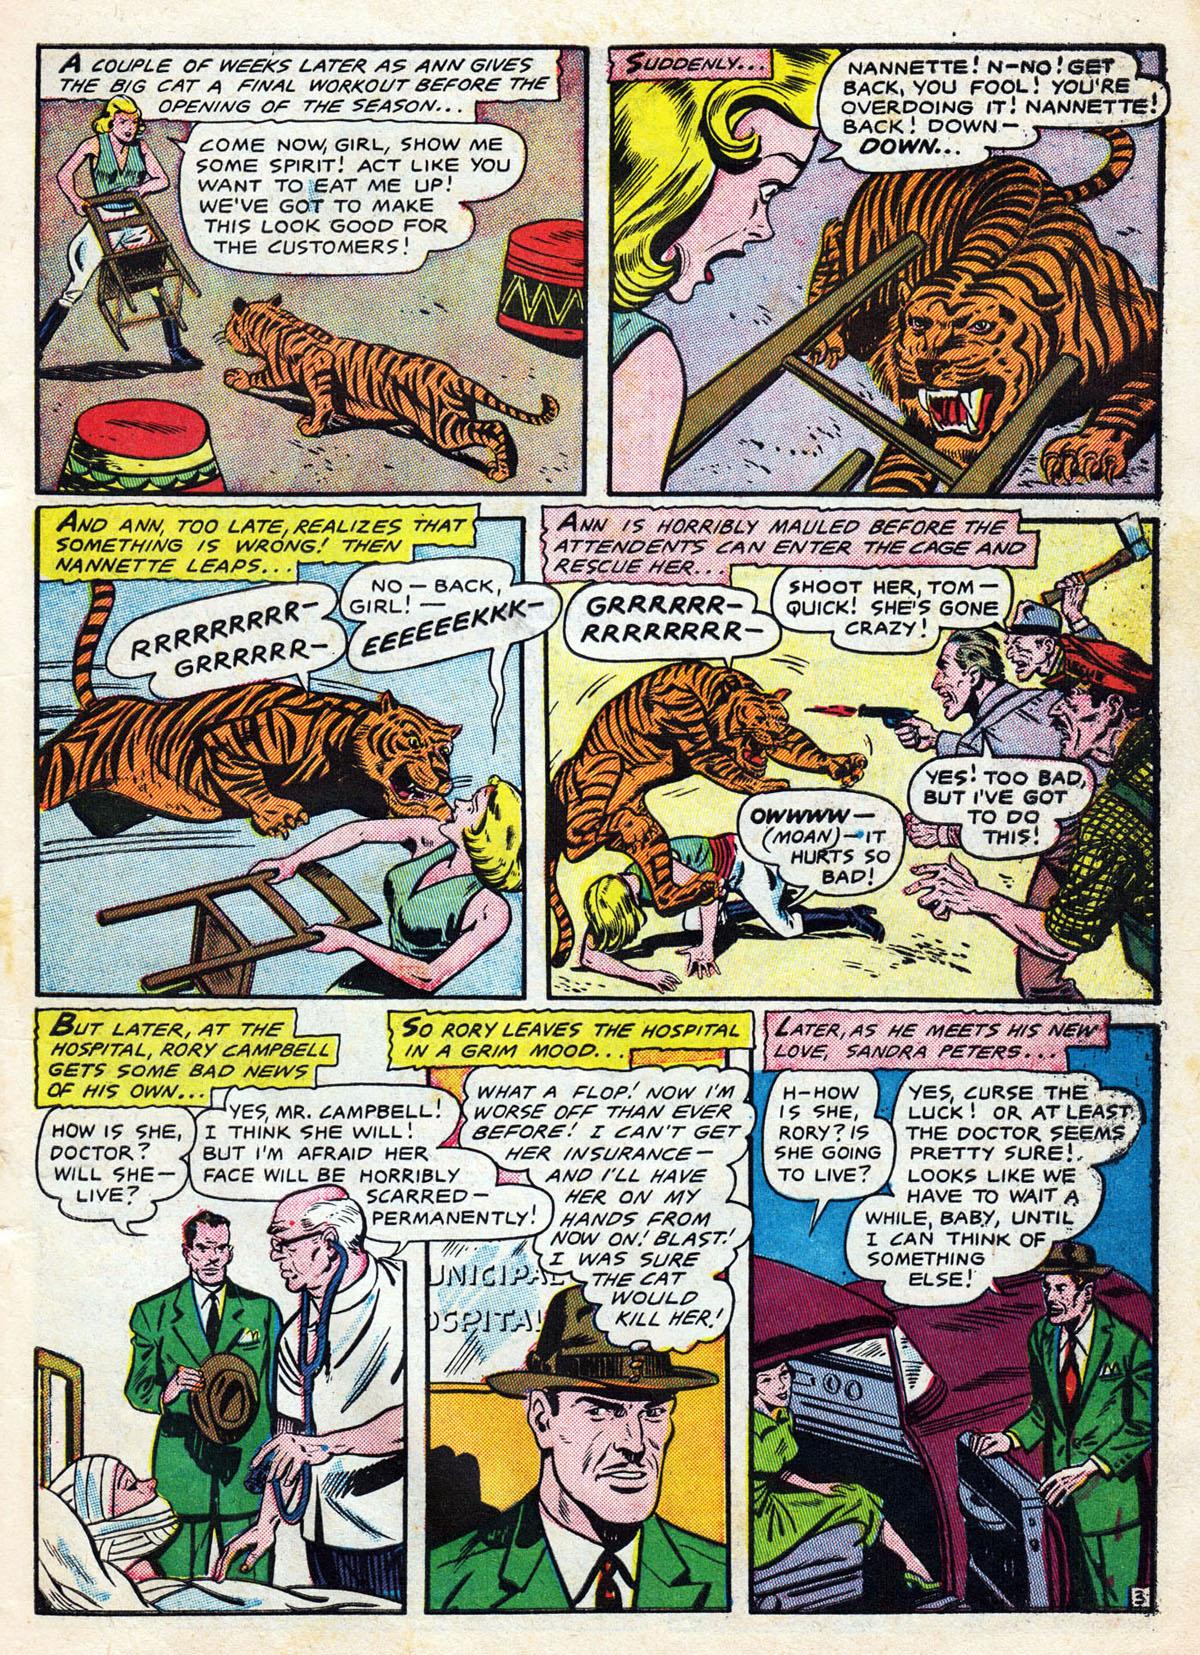 TigerTiger3